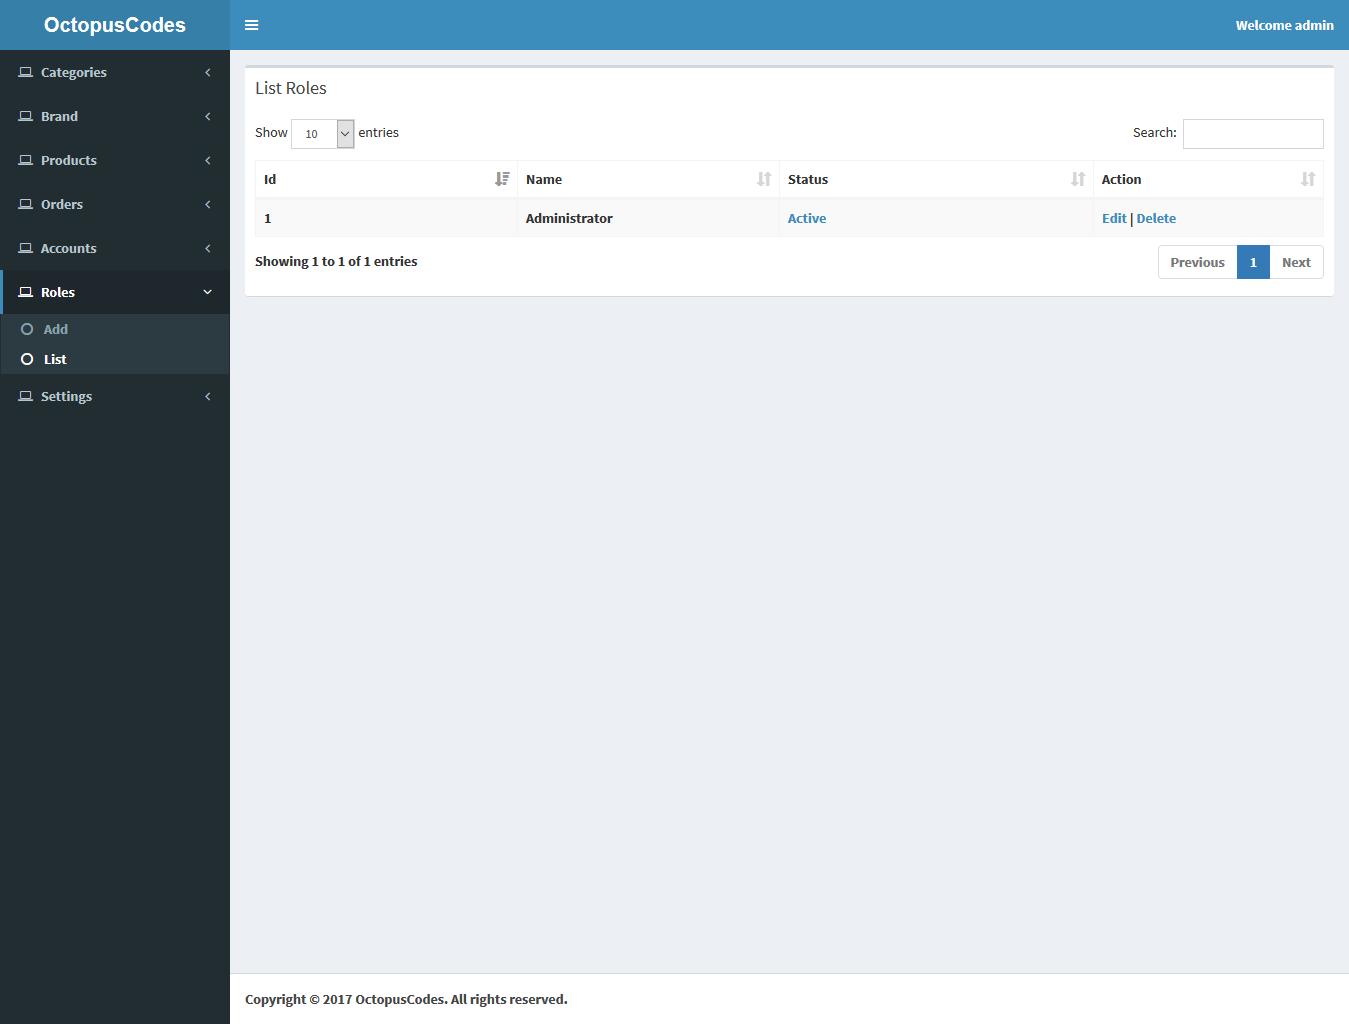 Angular 2 Shopping Cart - Angular 2 & CodeIgniter REST API